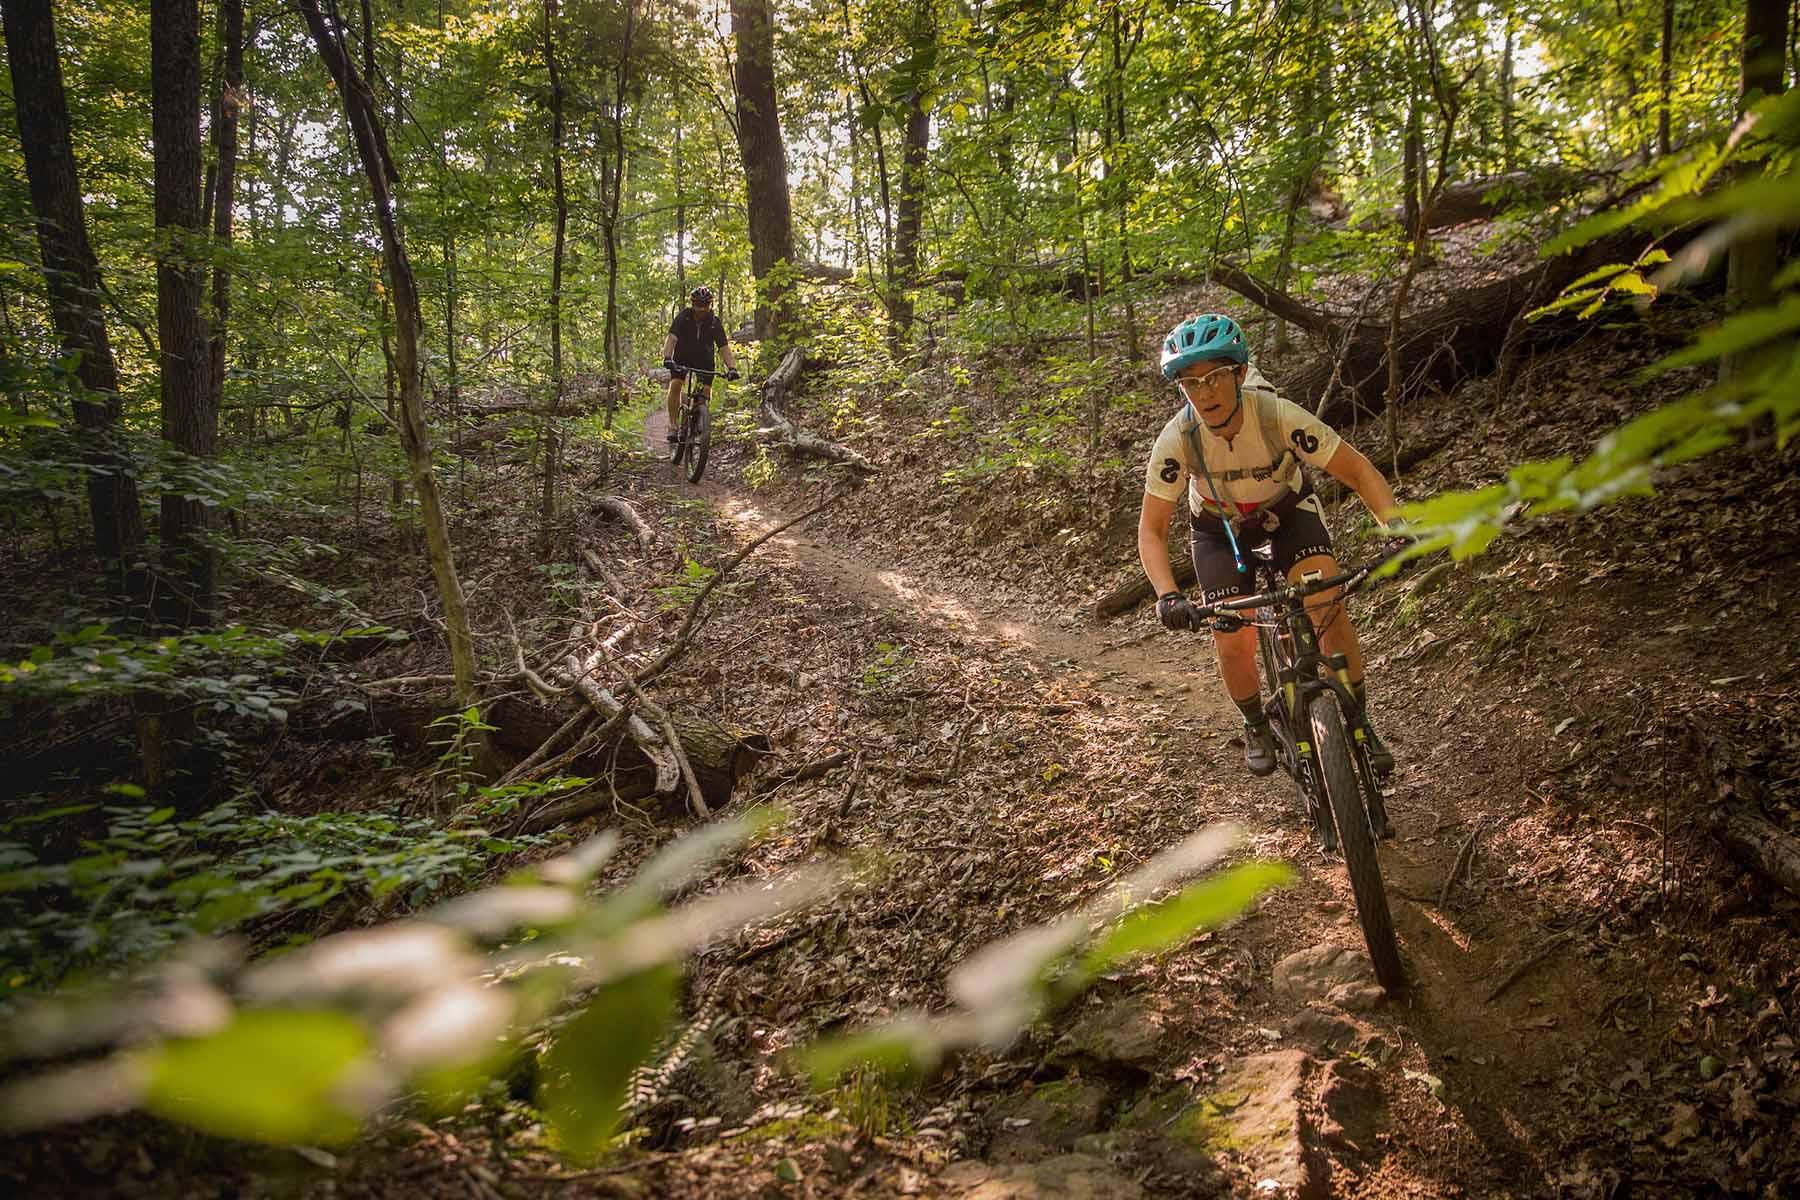 Mountain biking on Sundown Trail at Strouds Run State Park in Athens, Ohio on August 28, 2018